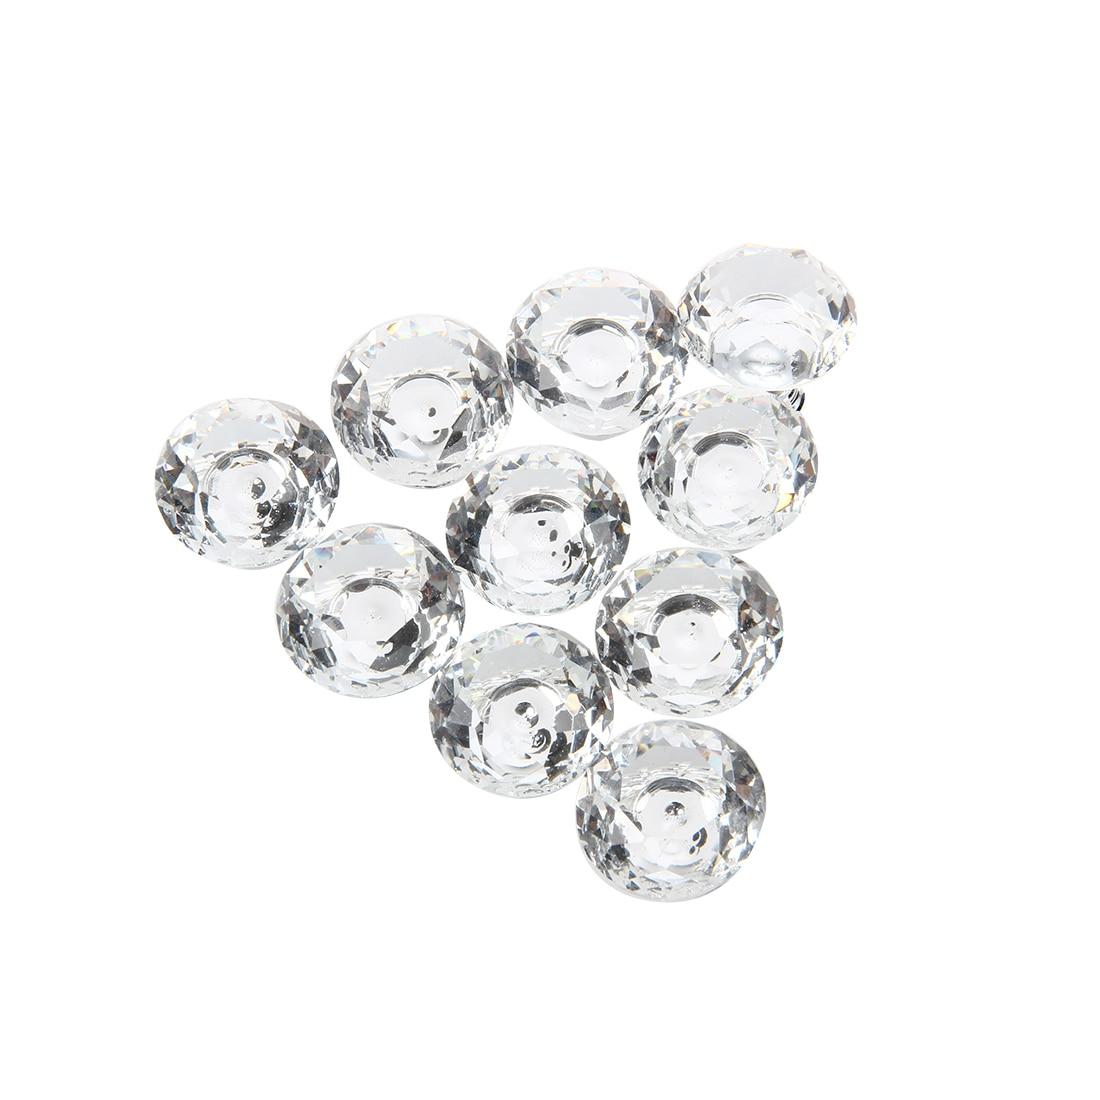 10pcs 30mm Diamond Crystal Glass Door Drawer Cabinet Furniture Handle Knob Screw free shipping hot sale 10pcs k9 crystal handles flash diamond archaize shiny drawer twinkle door knob bathroom handle crystal